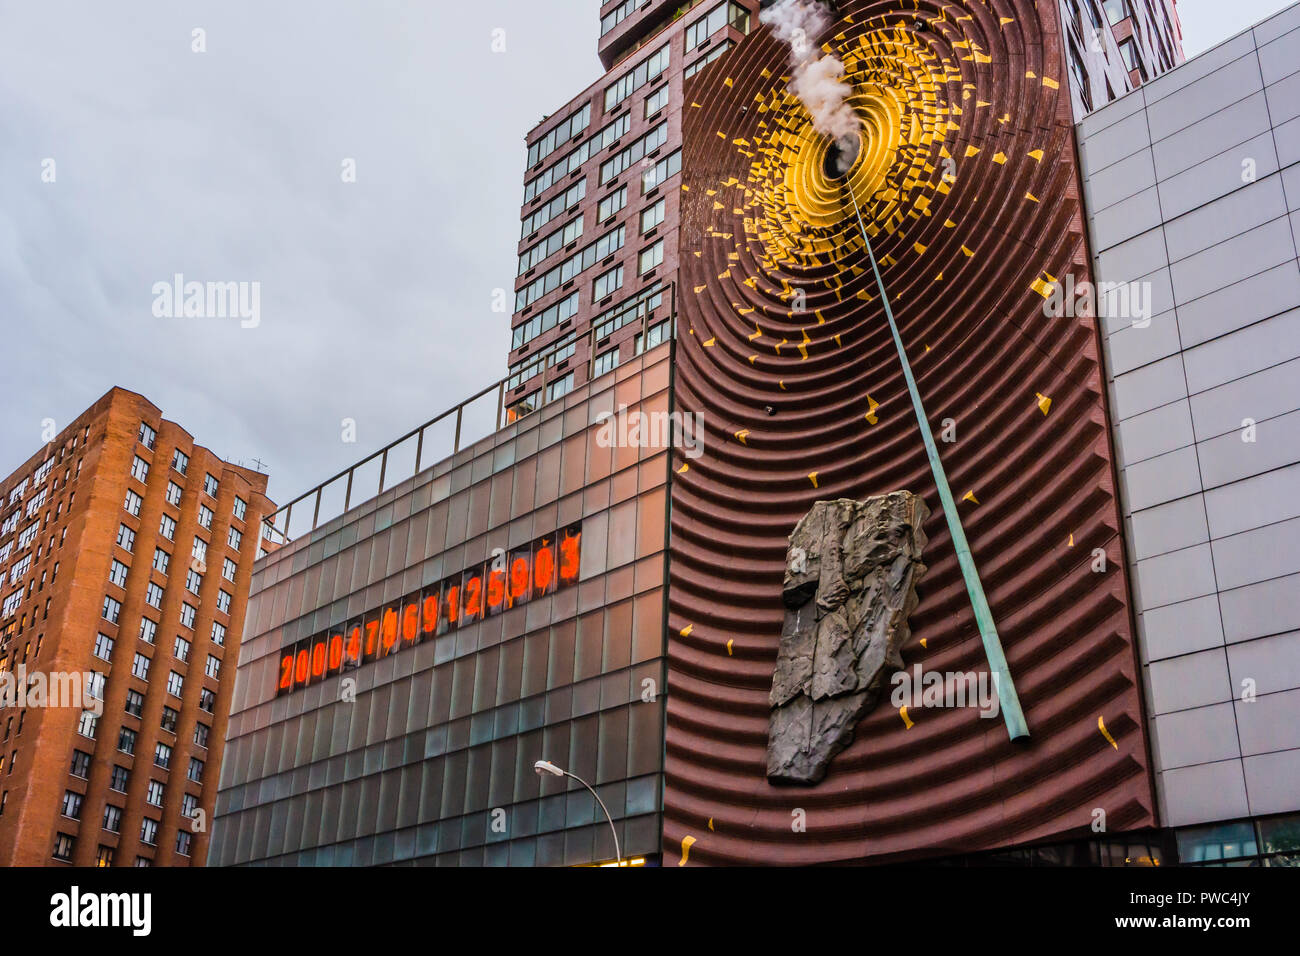 Metronome One Union Square Union Square Manhattan _ New York, New York, USA - Stock Image